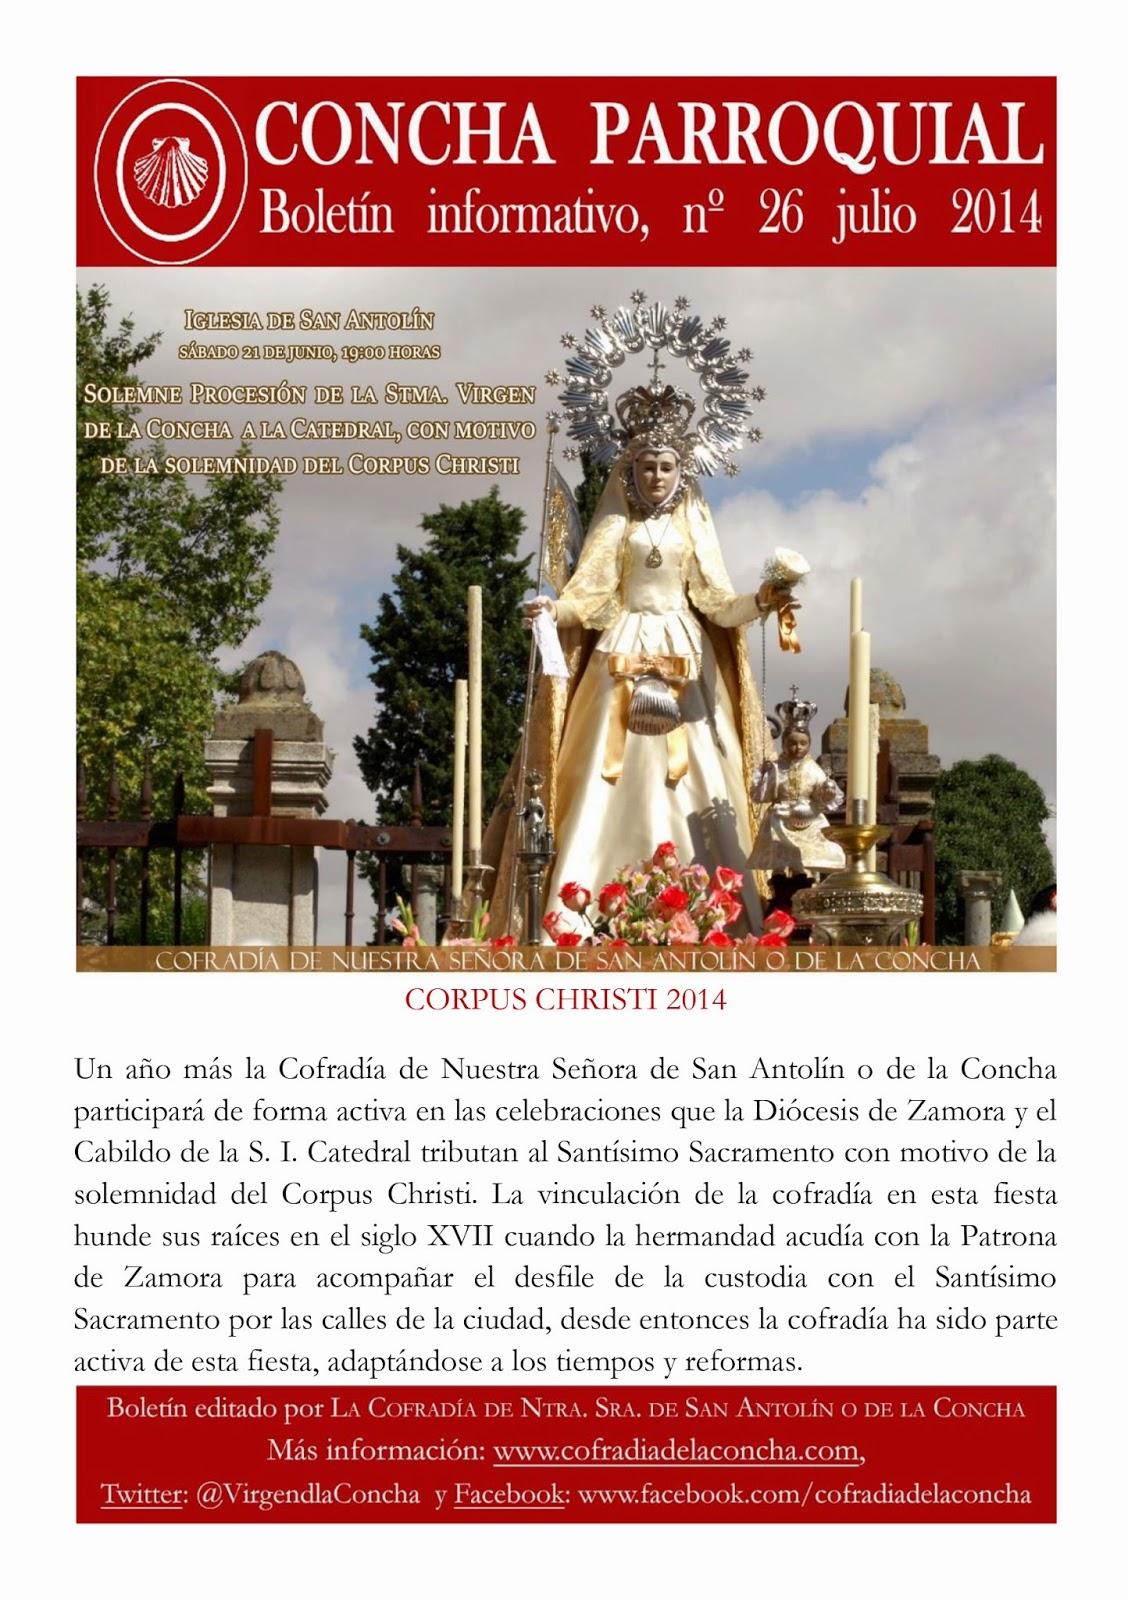 cofradiadelaconcha.com/Boletines/2014/Julio2014.pdf